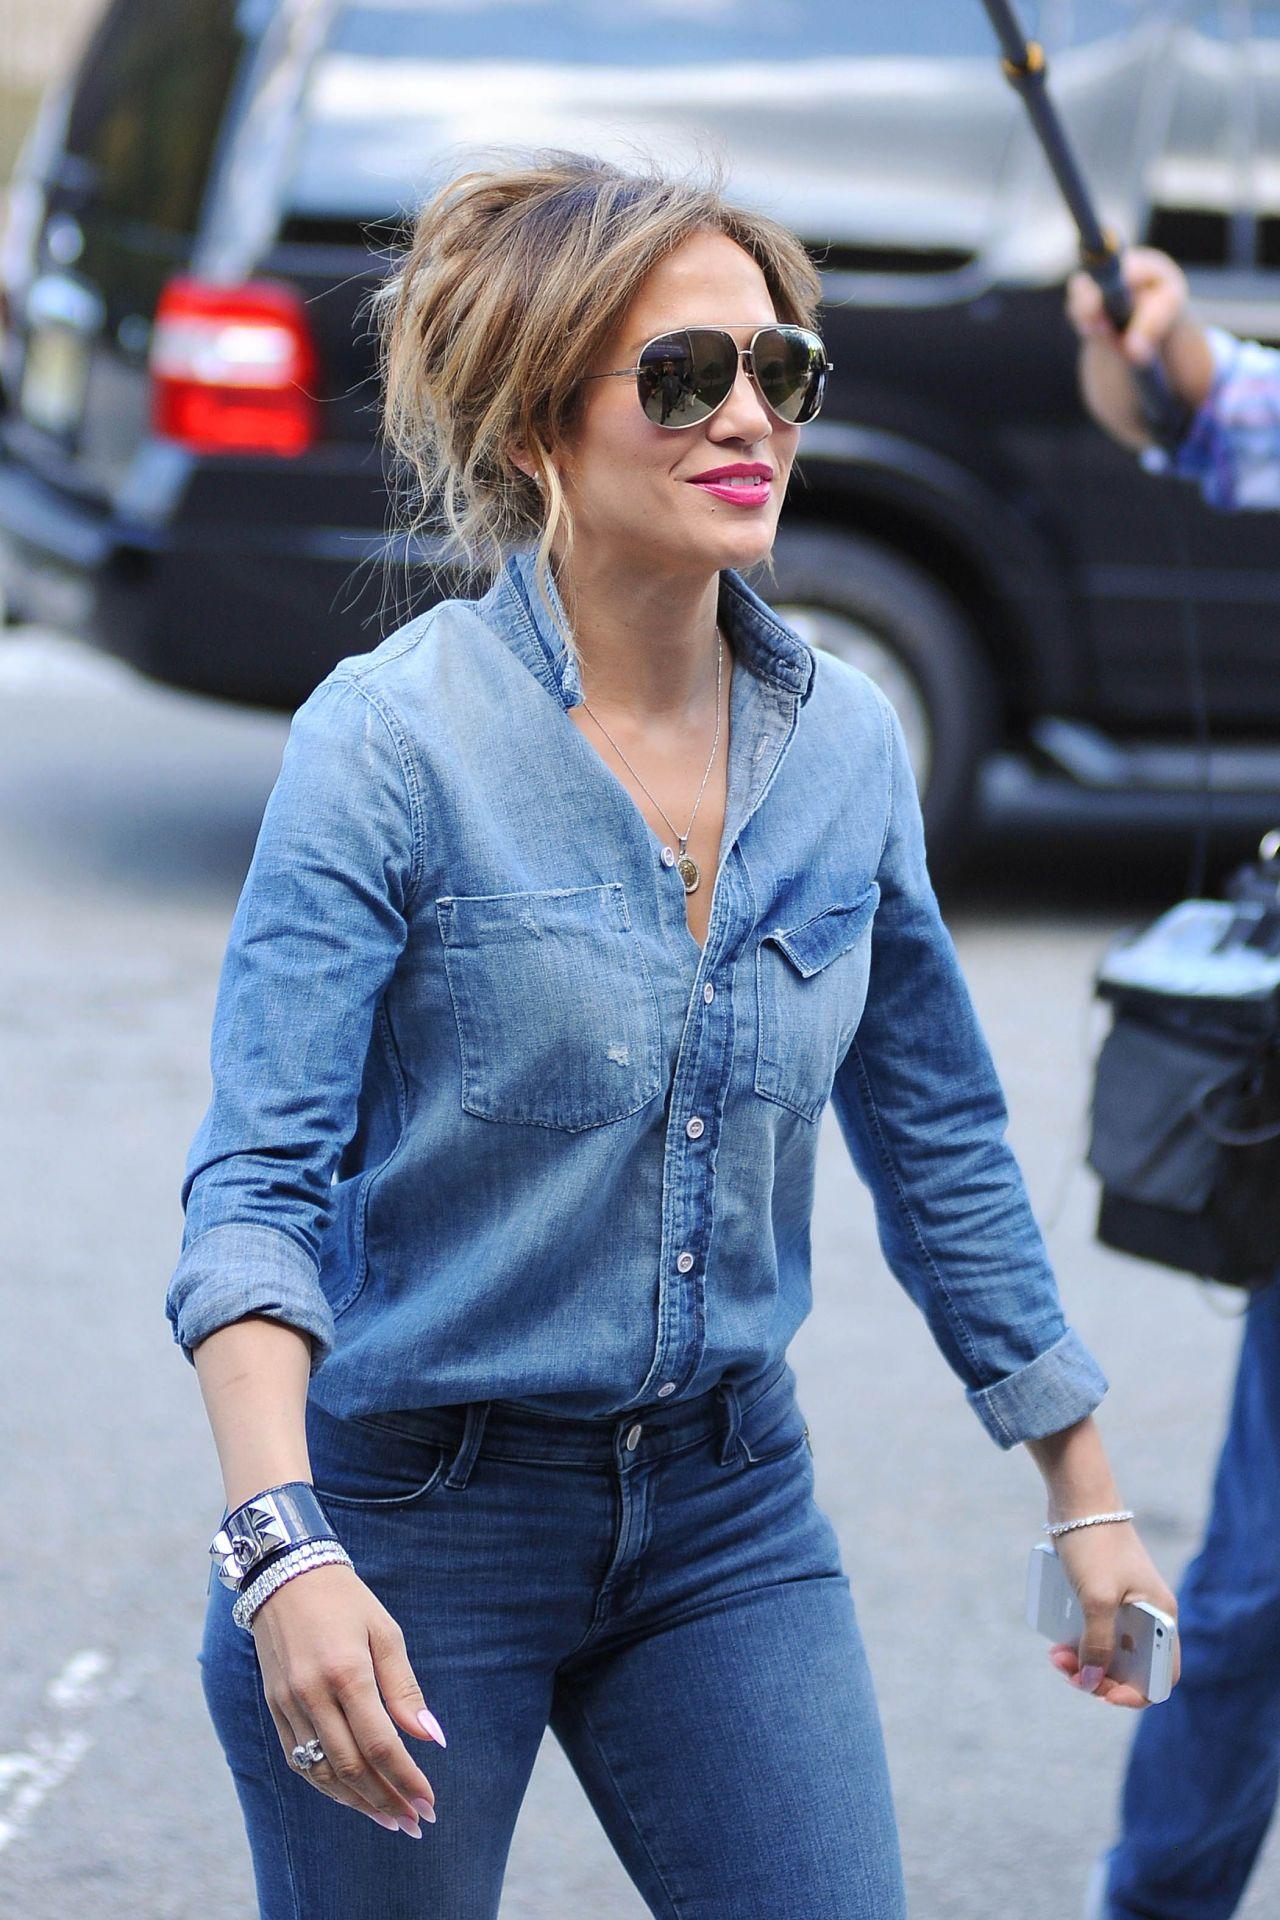 Jennifer Lopez Booty In Jeans Filming In The Bronx